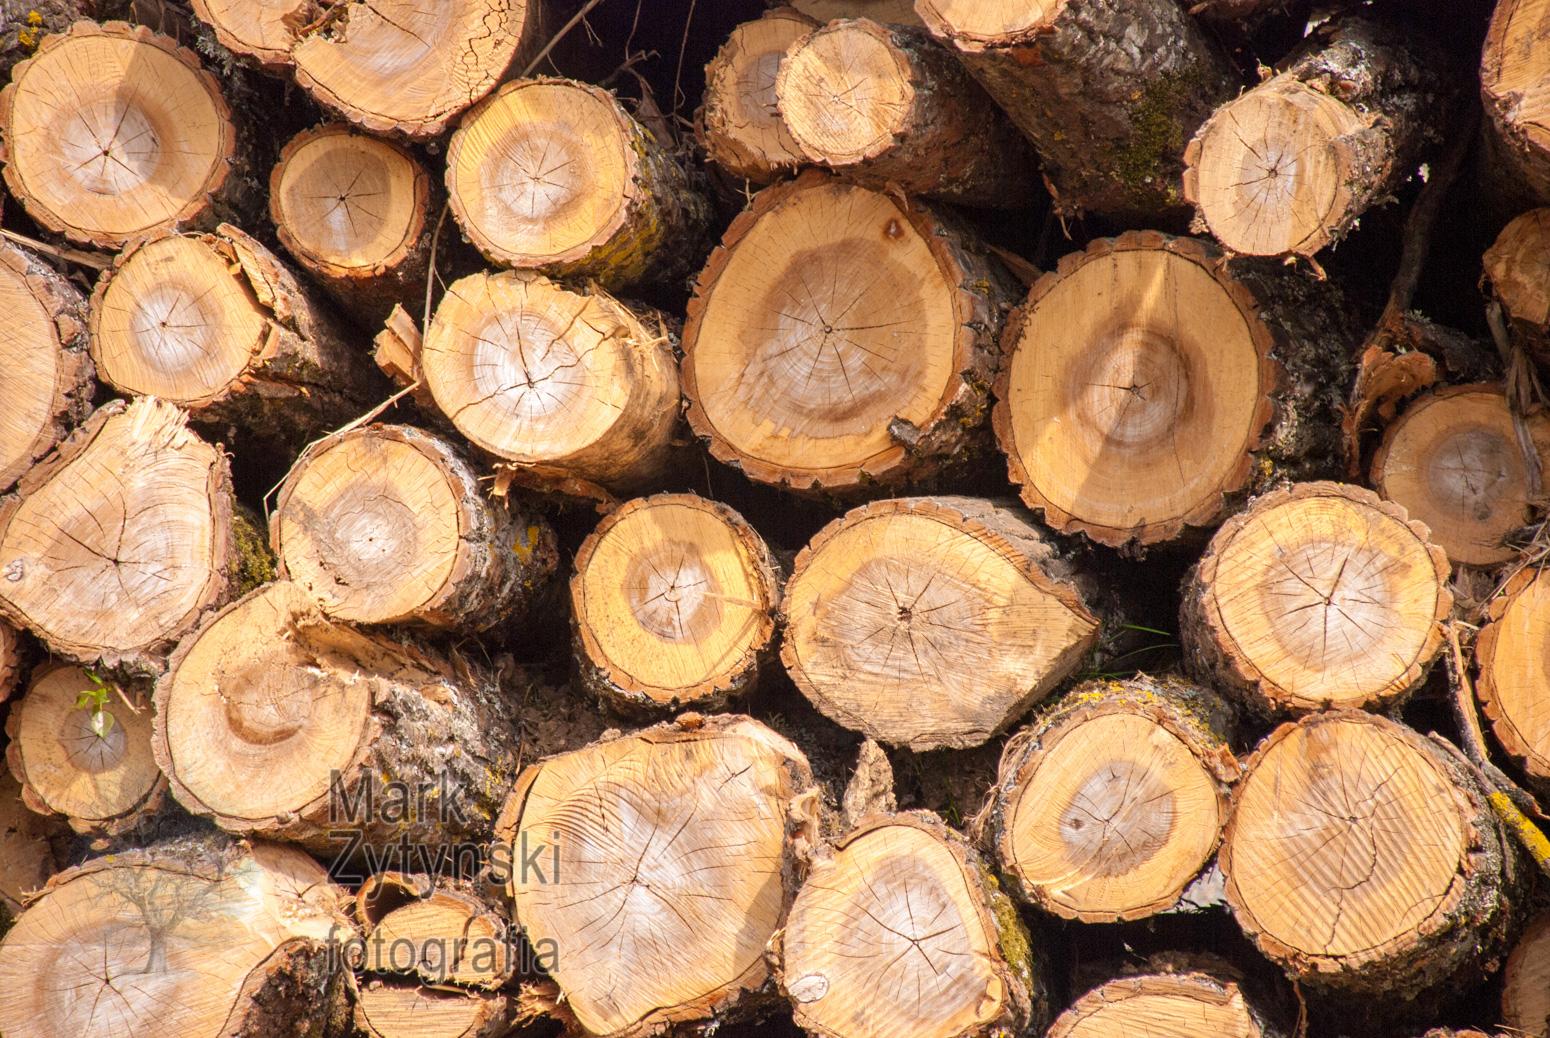 Zytynski-trees-logs-log-piles-5554.jpg